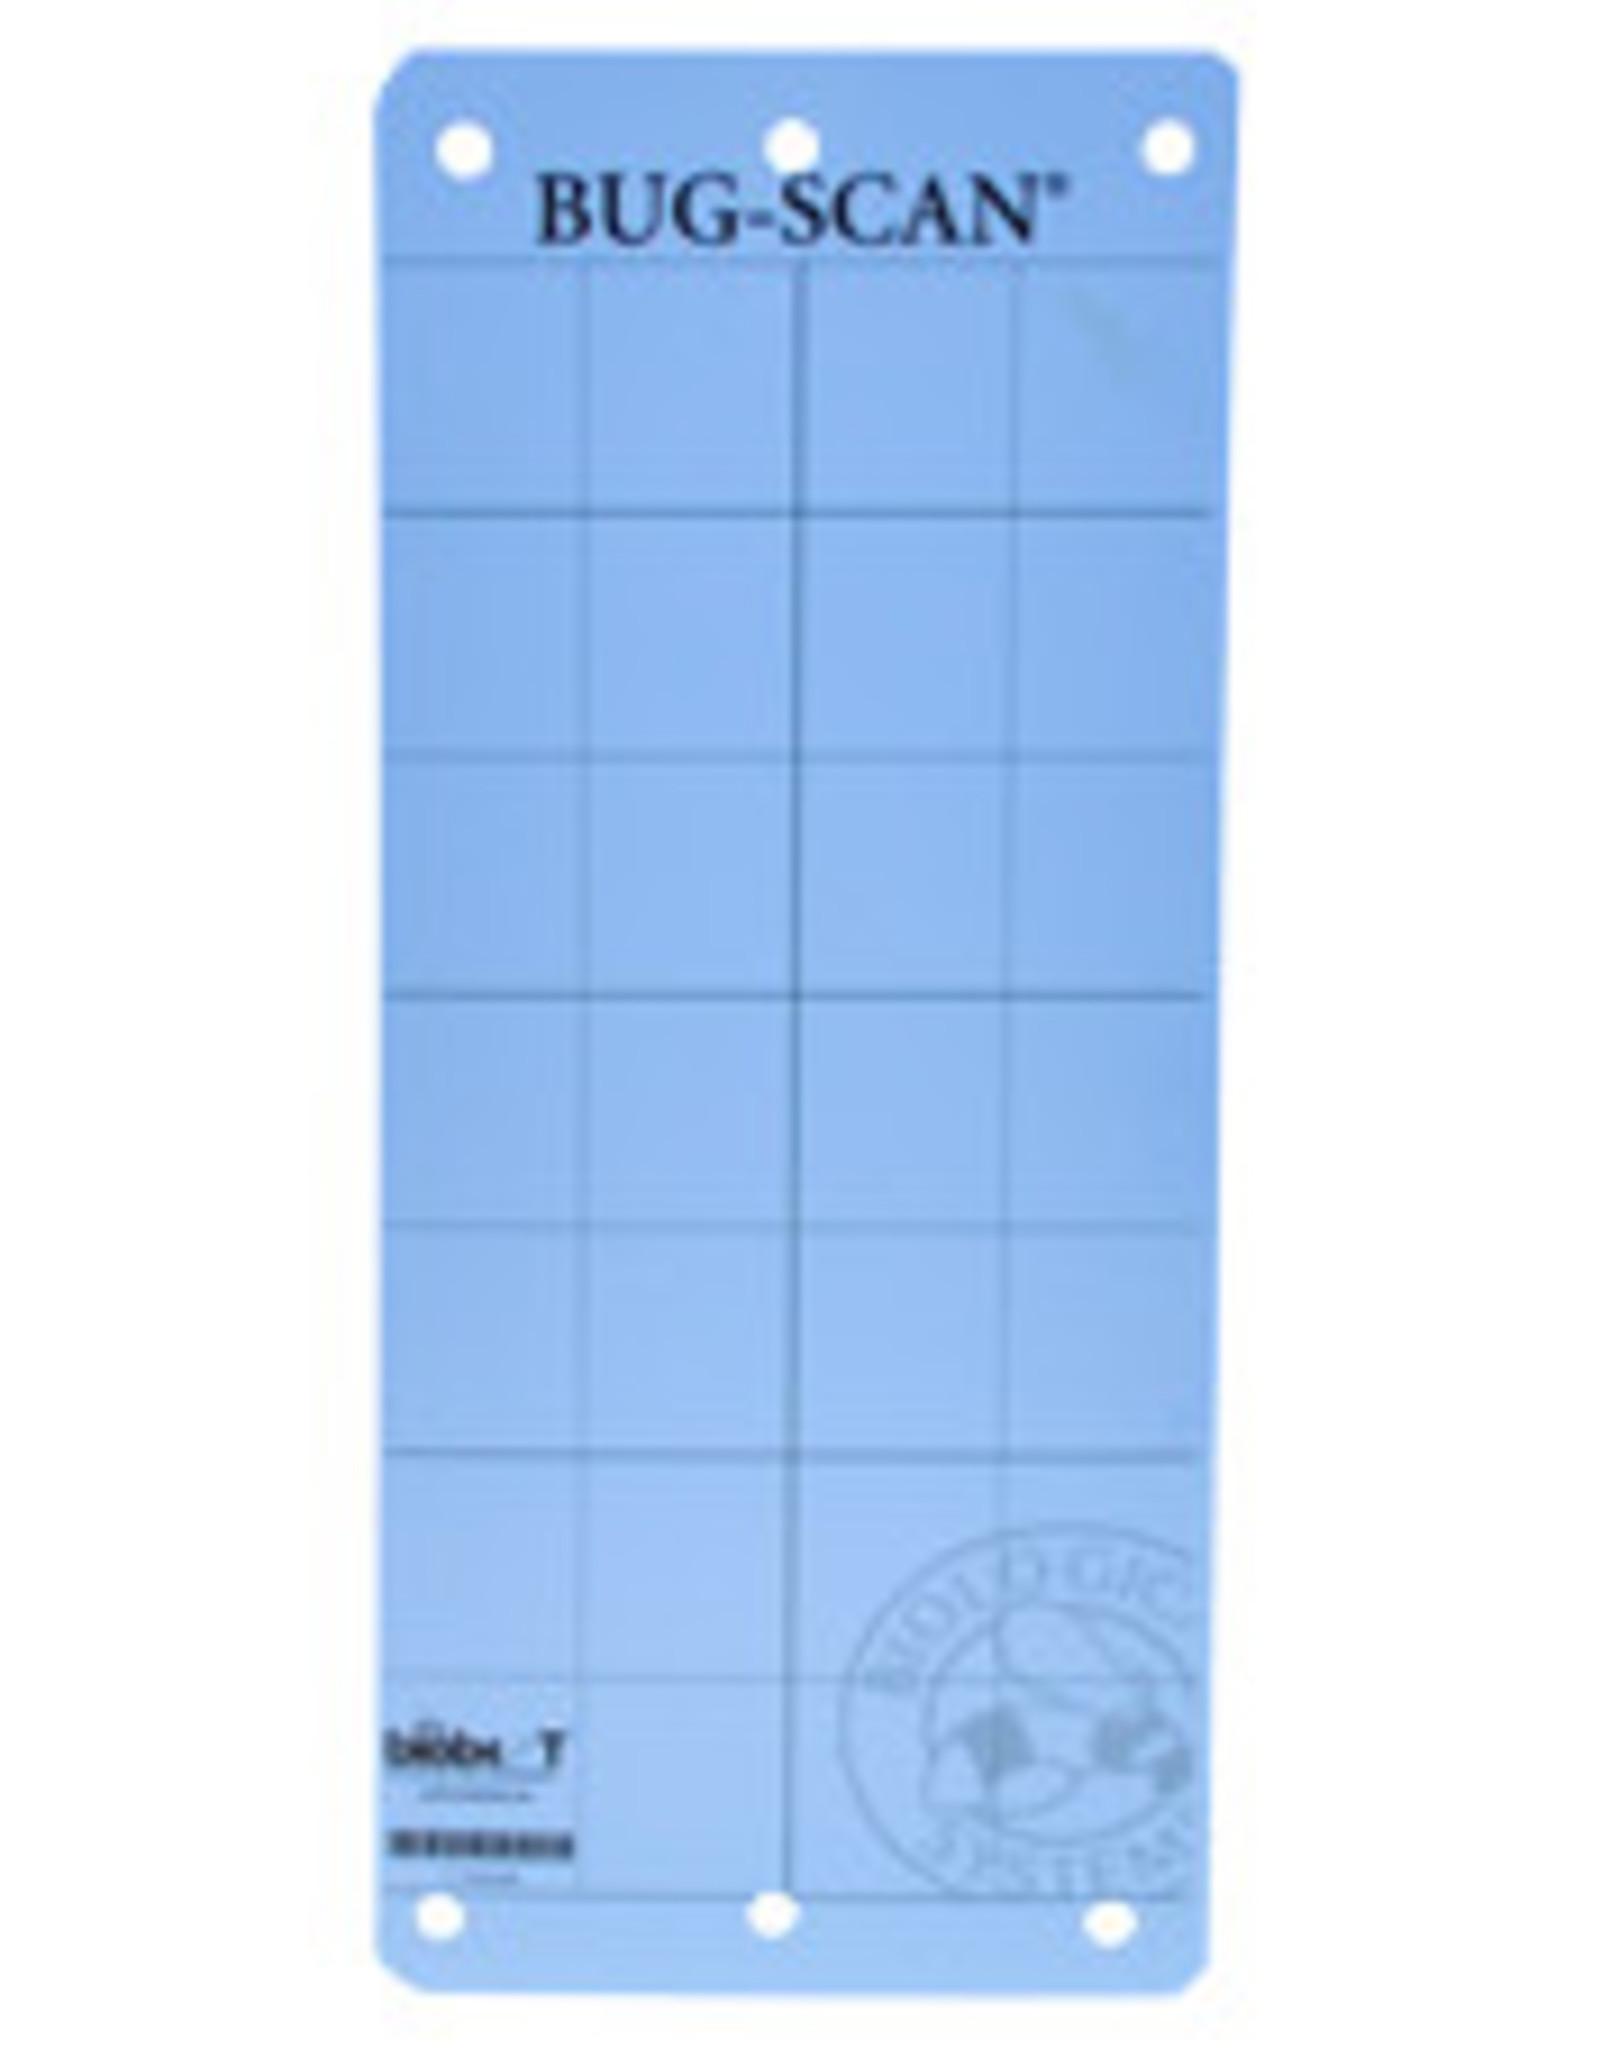 Brimex Biobest Brimex Bug Scan vangstrook blauw 10 stuks 25 X 10 cm